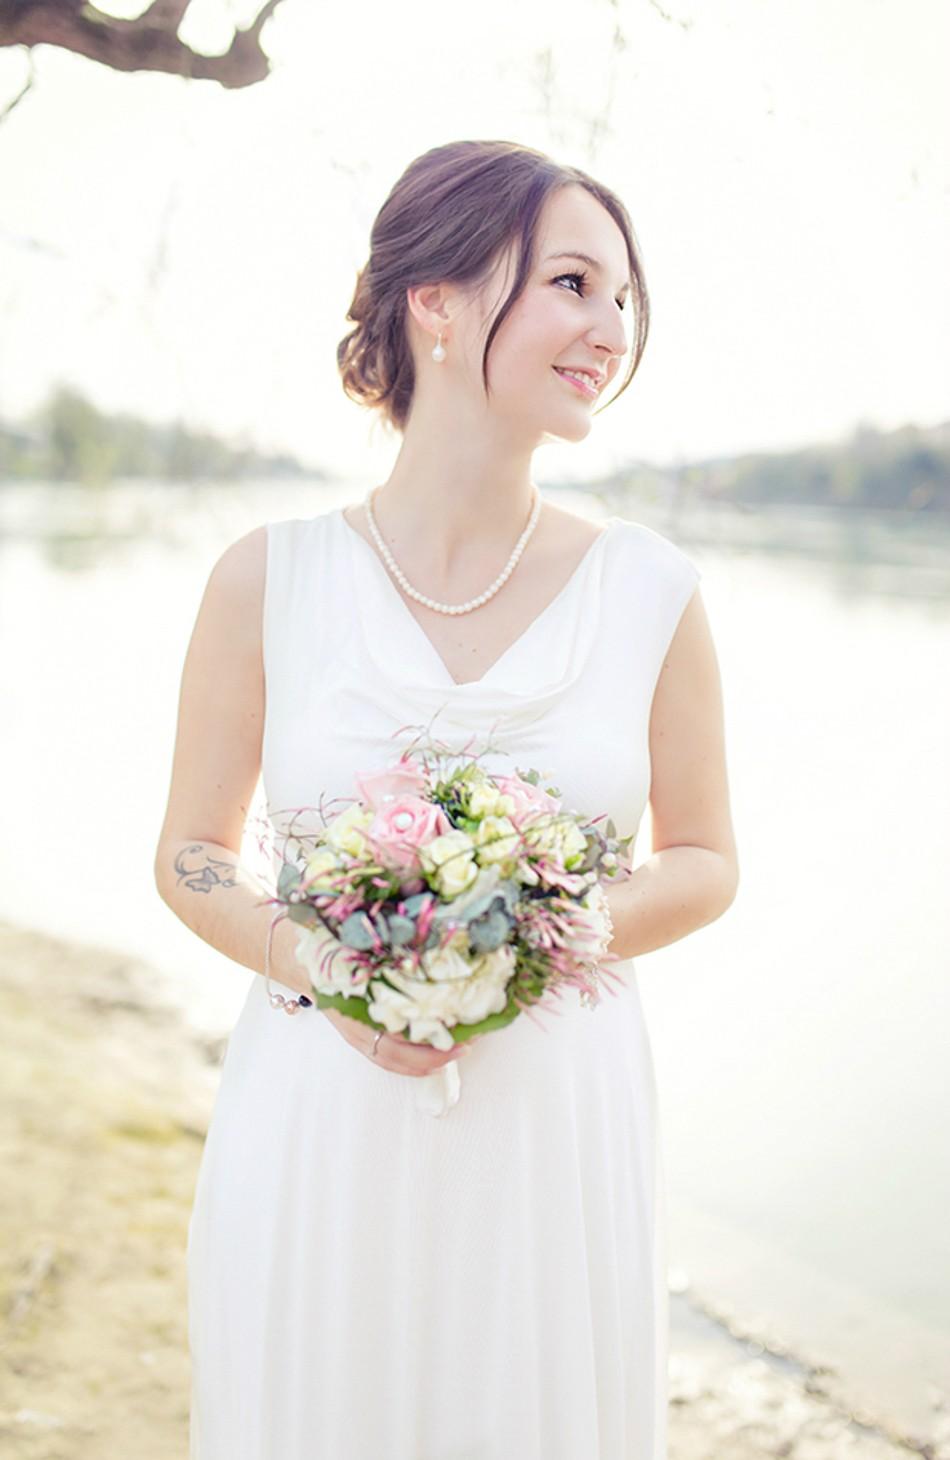 Brautpaarshooting-Inseli-Vintage-Fotograf-Vintage (2 von 4)